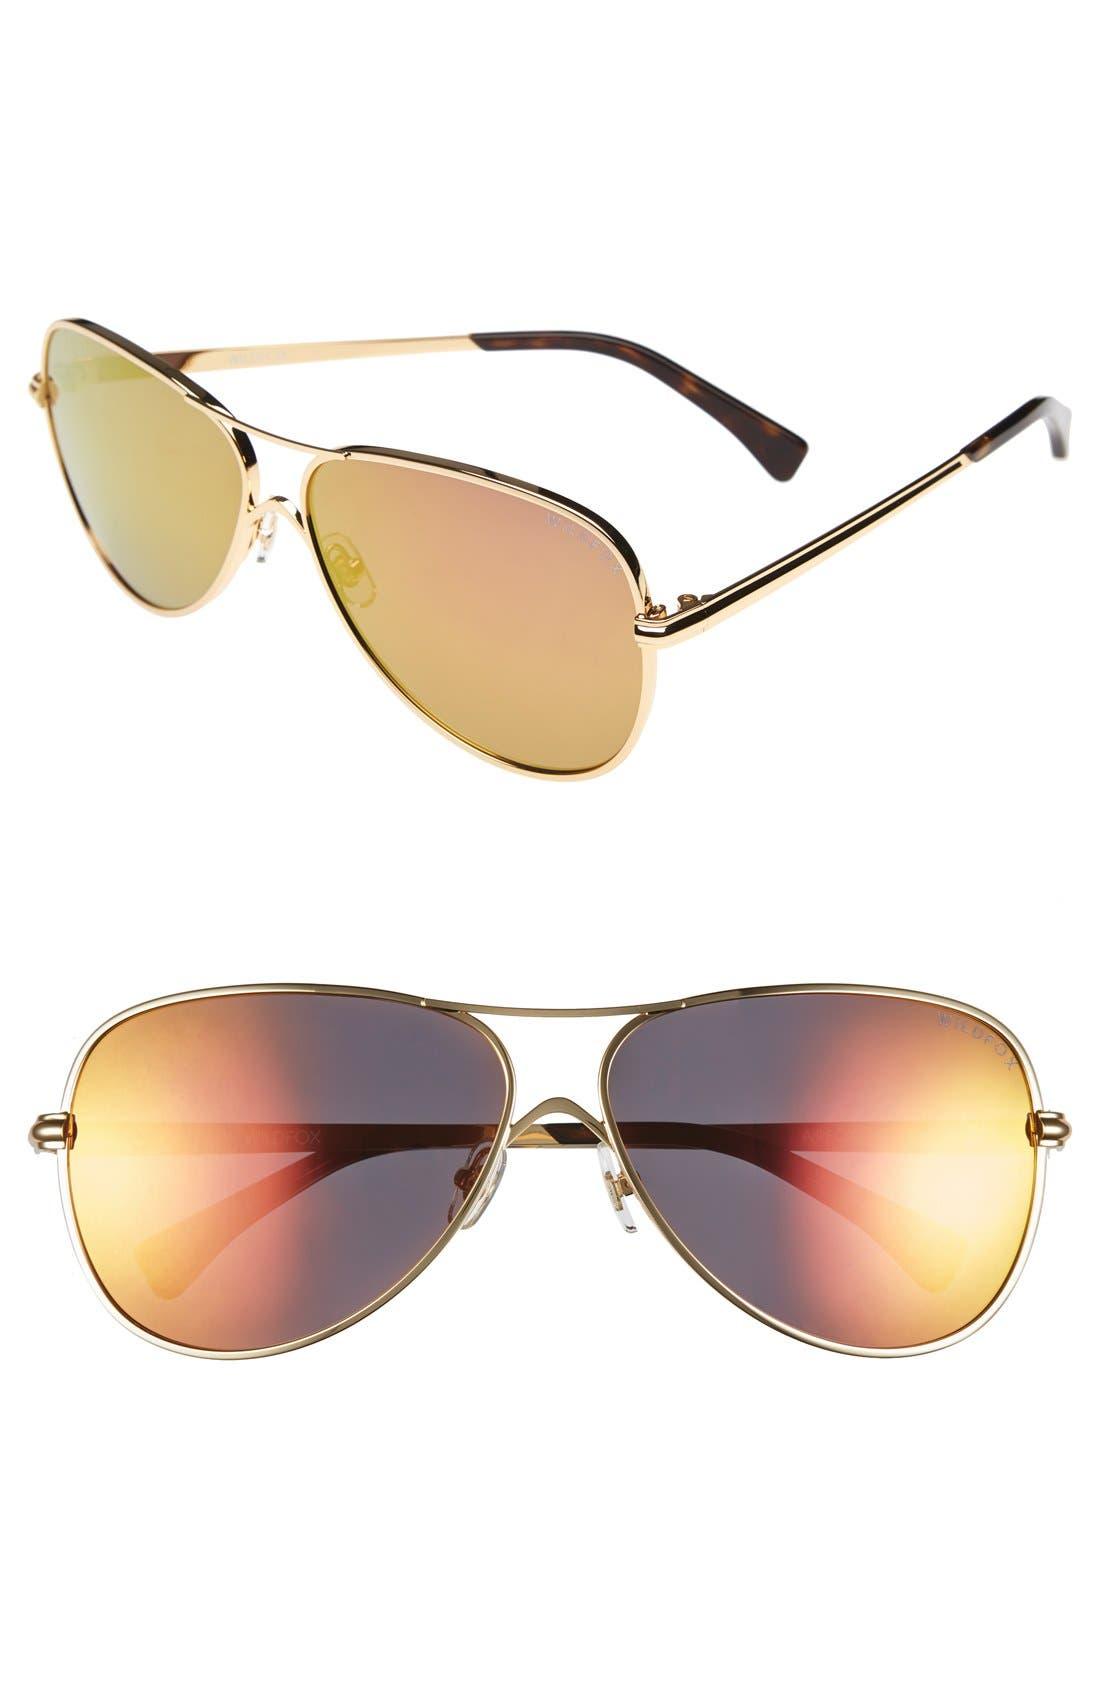 Alternate Image 1 Selected - Wildfox 'Airfox' 62mm Aviator Sunglasses